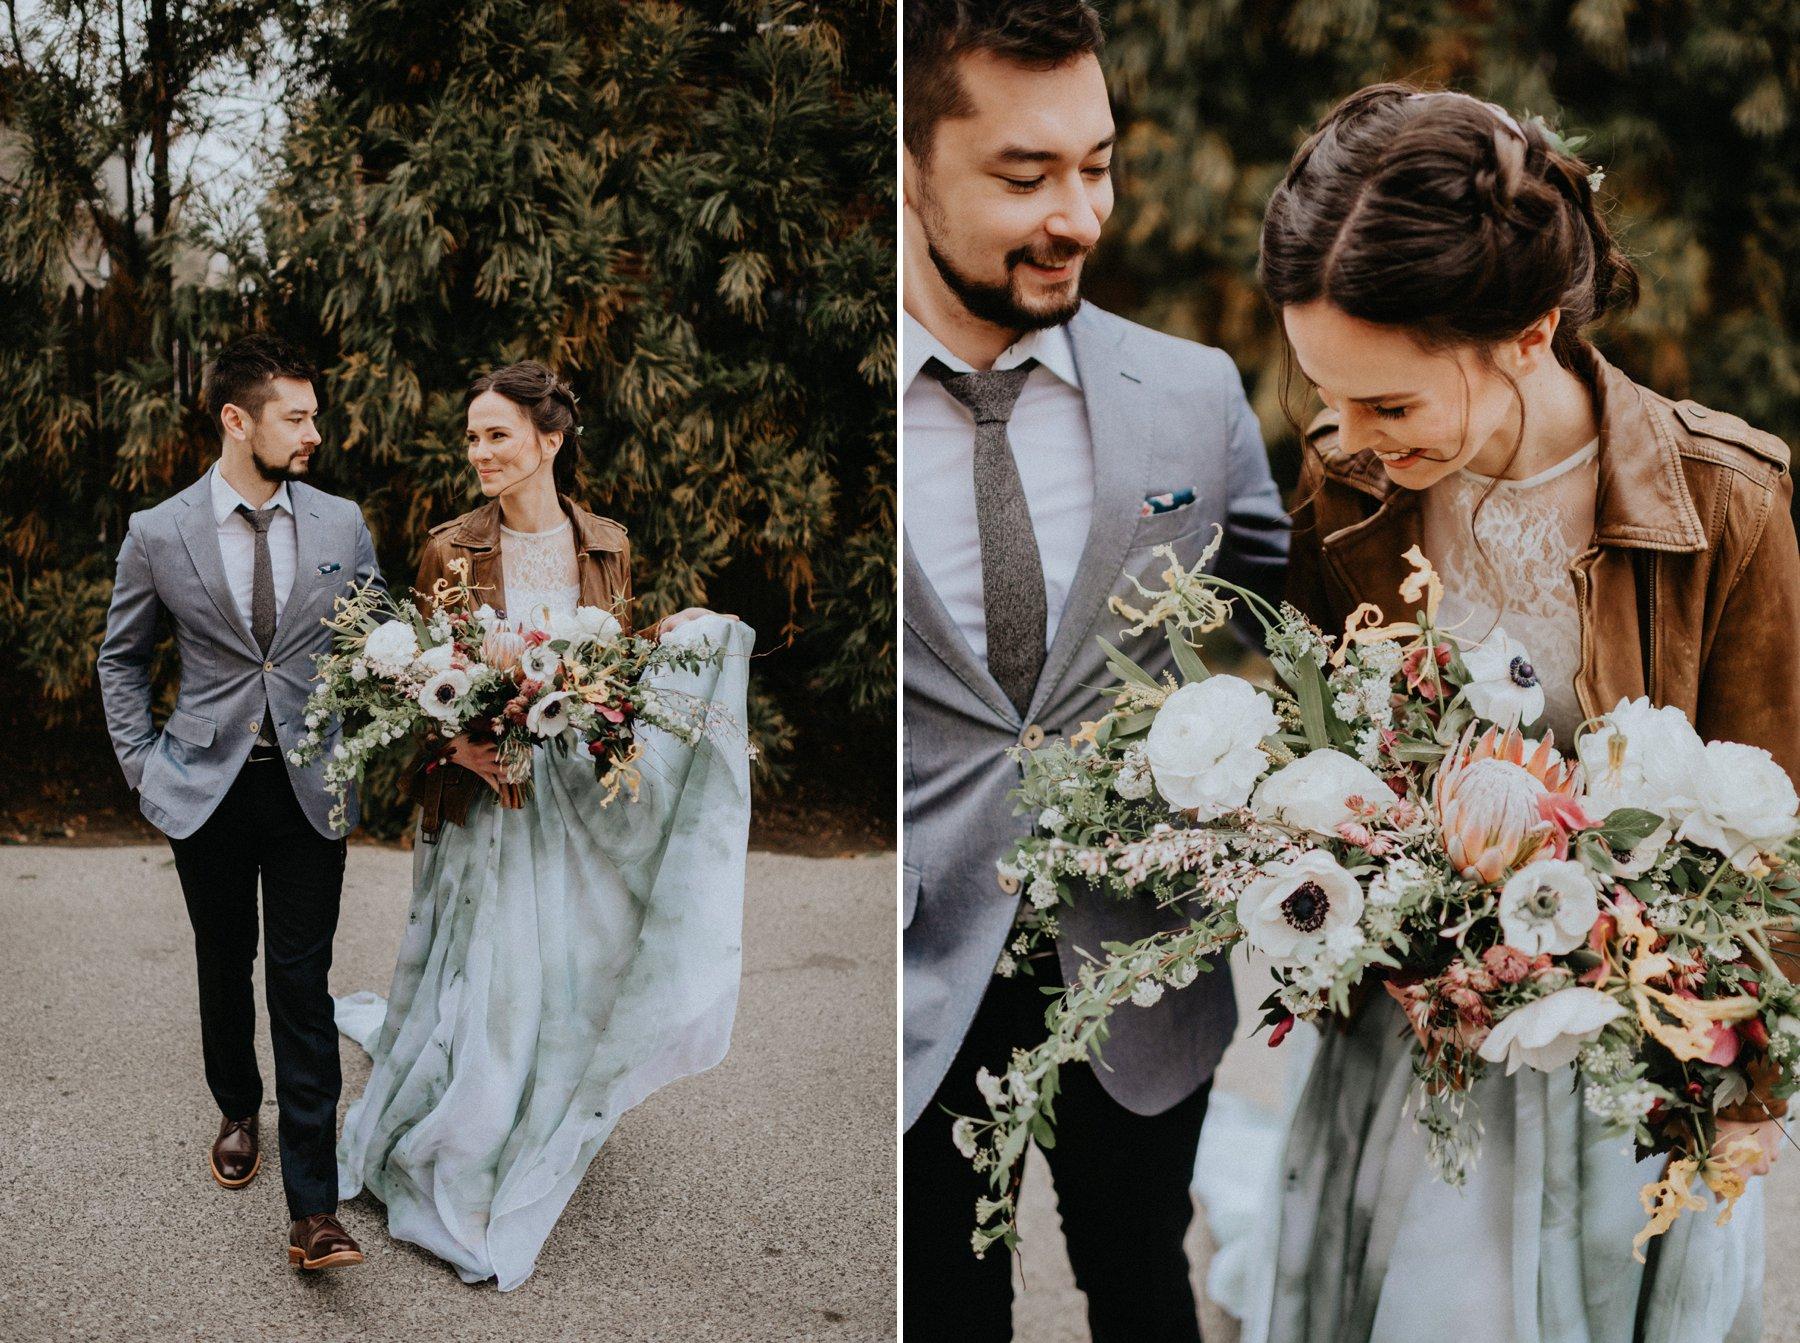 greenhouse-botanical-wedding-18.jpg